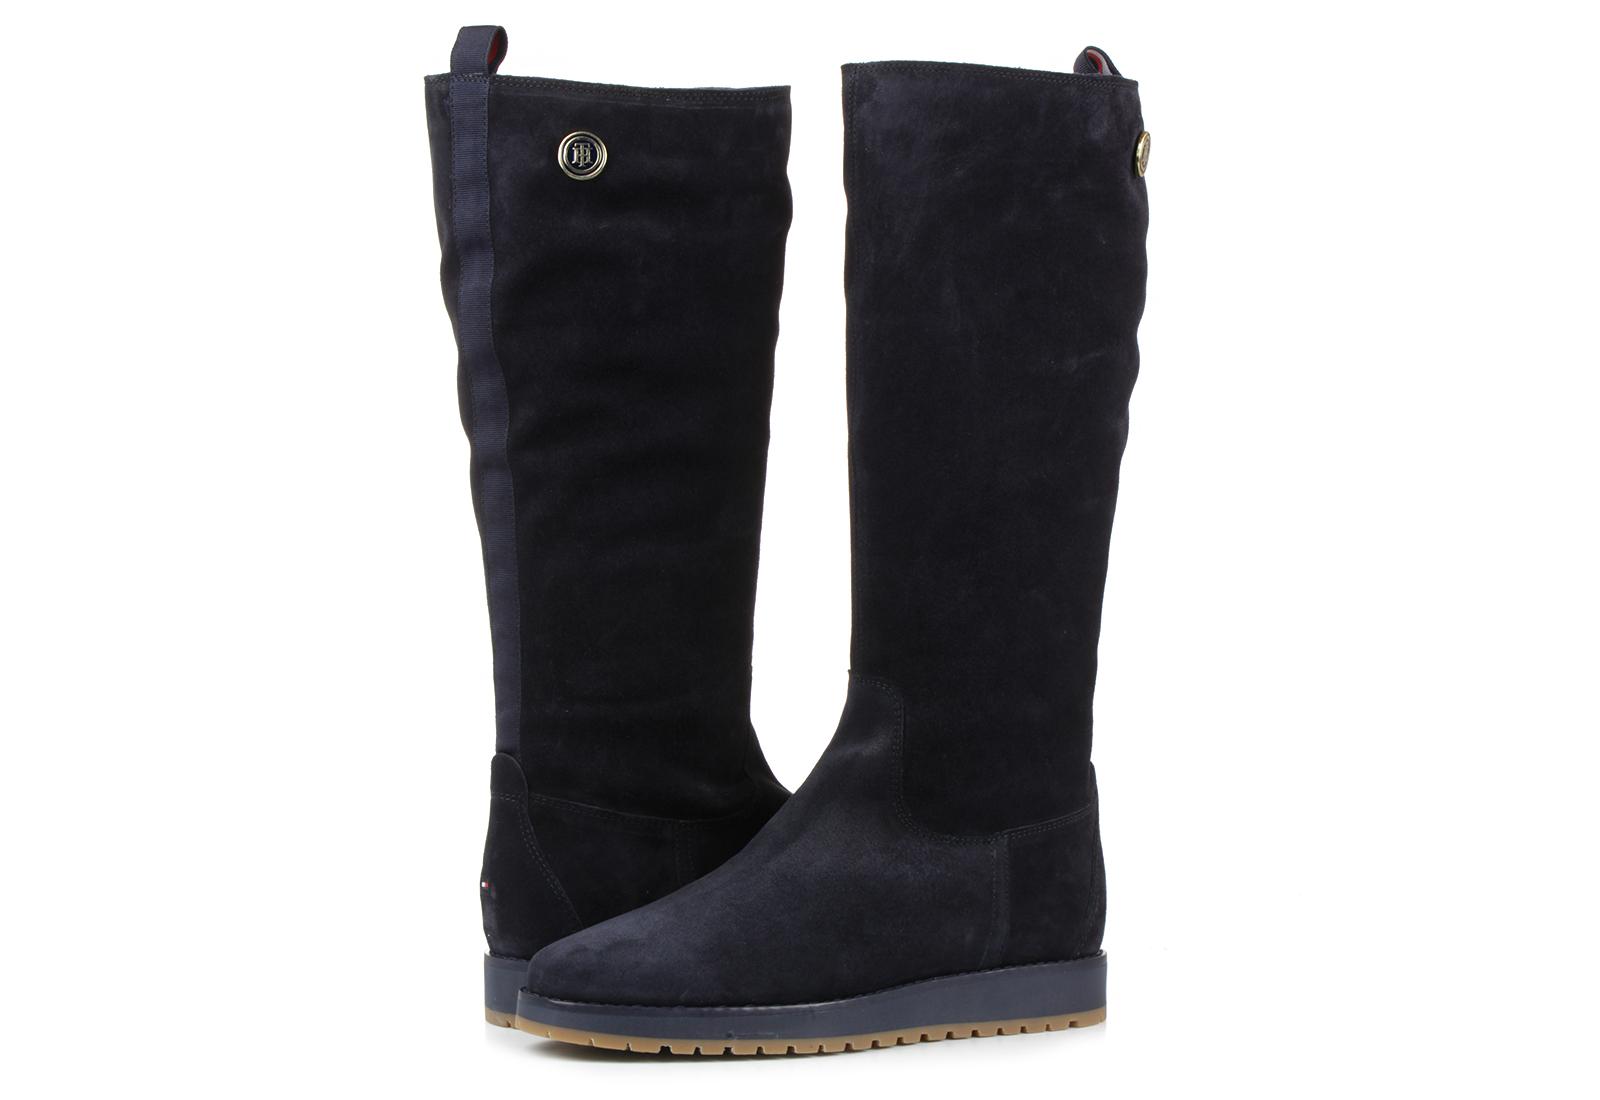 67431acb7c49b0 Tommy Hilfiger Boots - Rita 4b - 17F-1533-403 - Online shop for ...